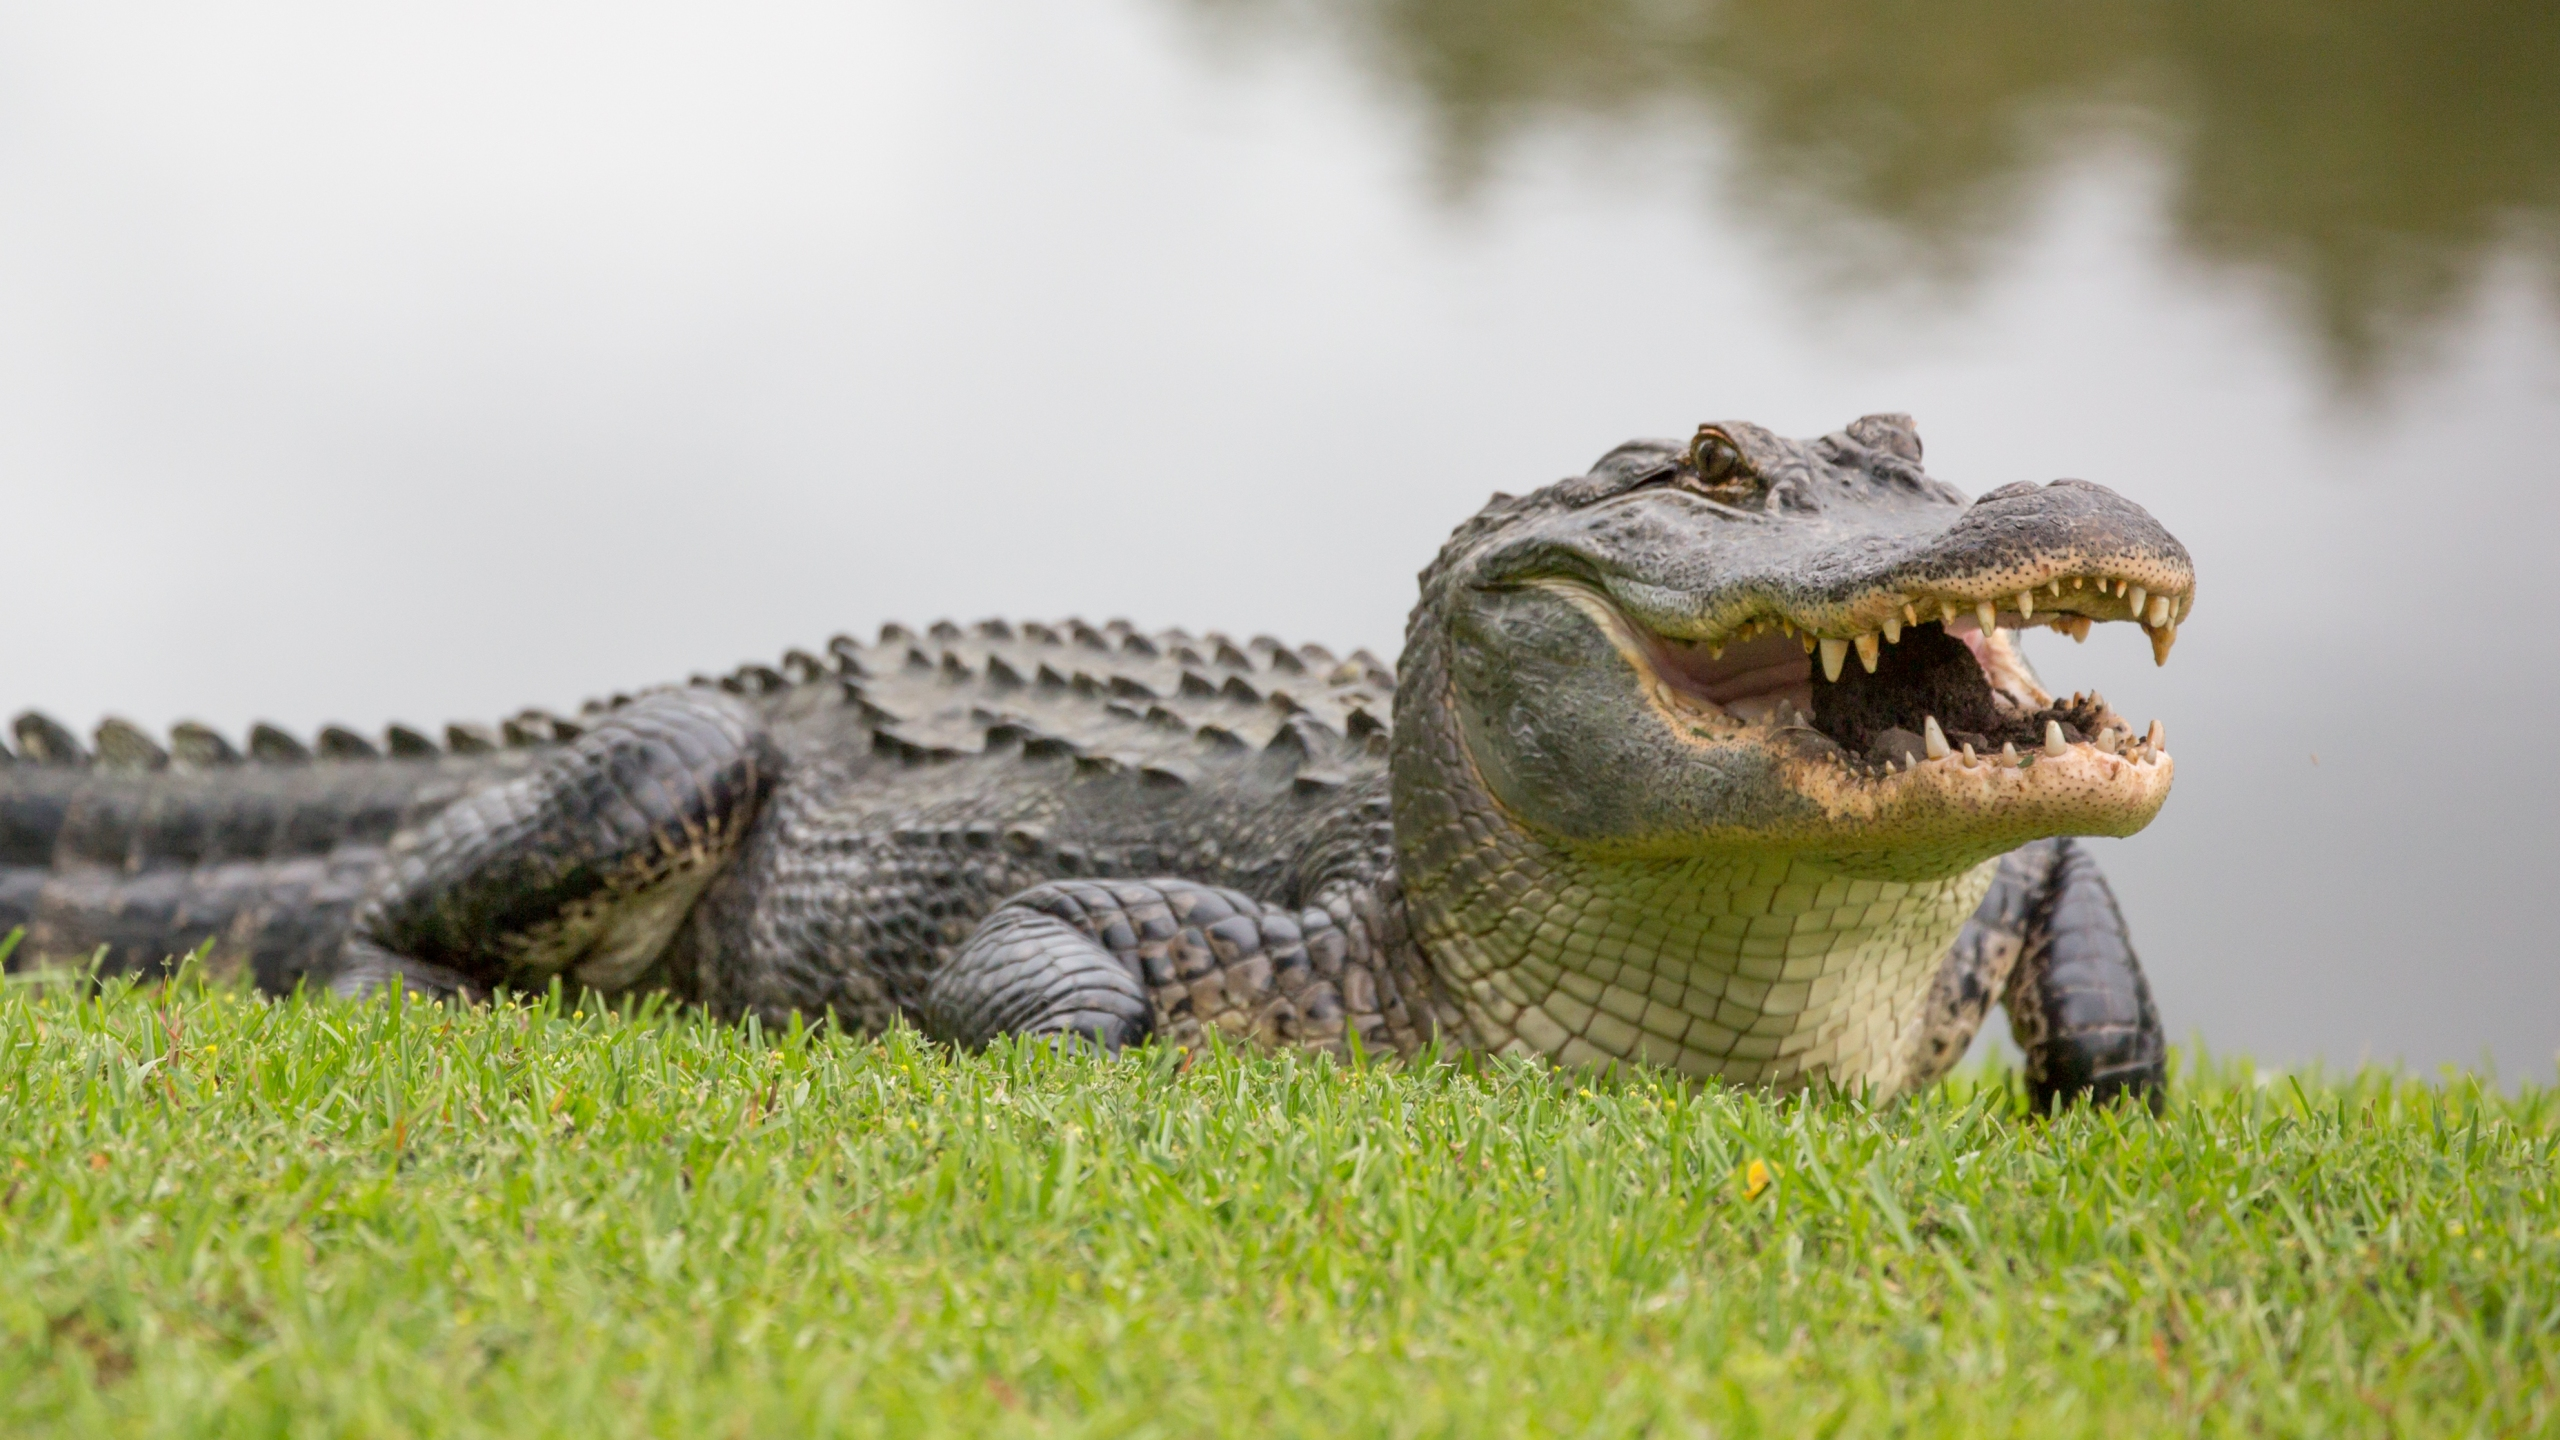 Alligator (Getty Images)